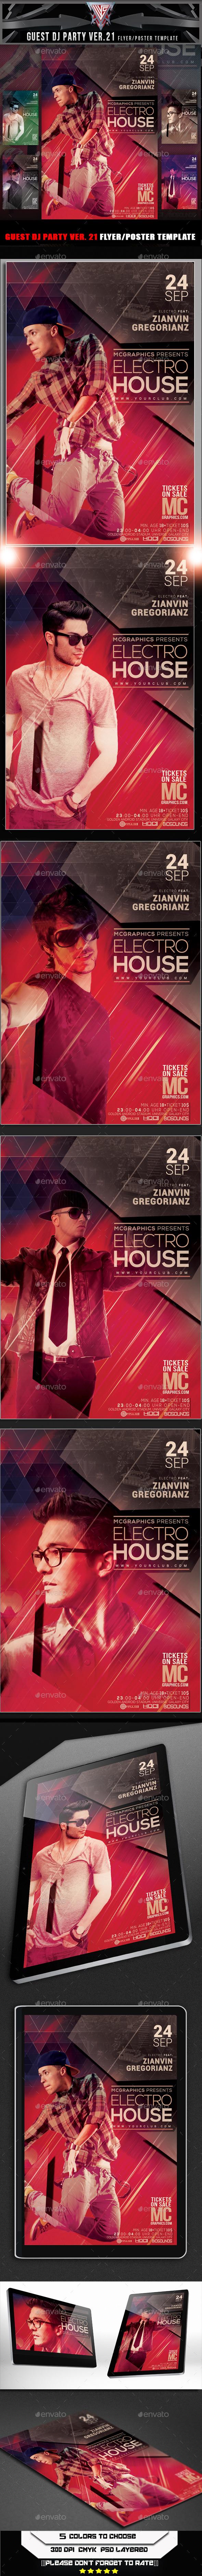 GraphicRiver Edit Guest DJ Party Ver 21 Flyer Template 11554855